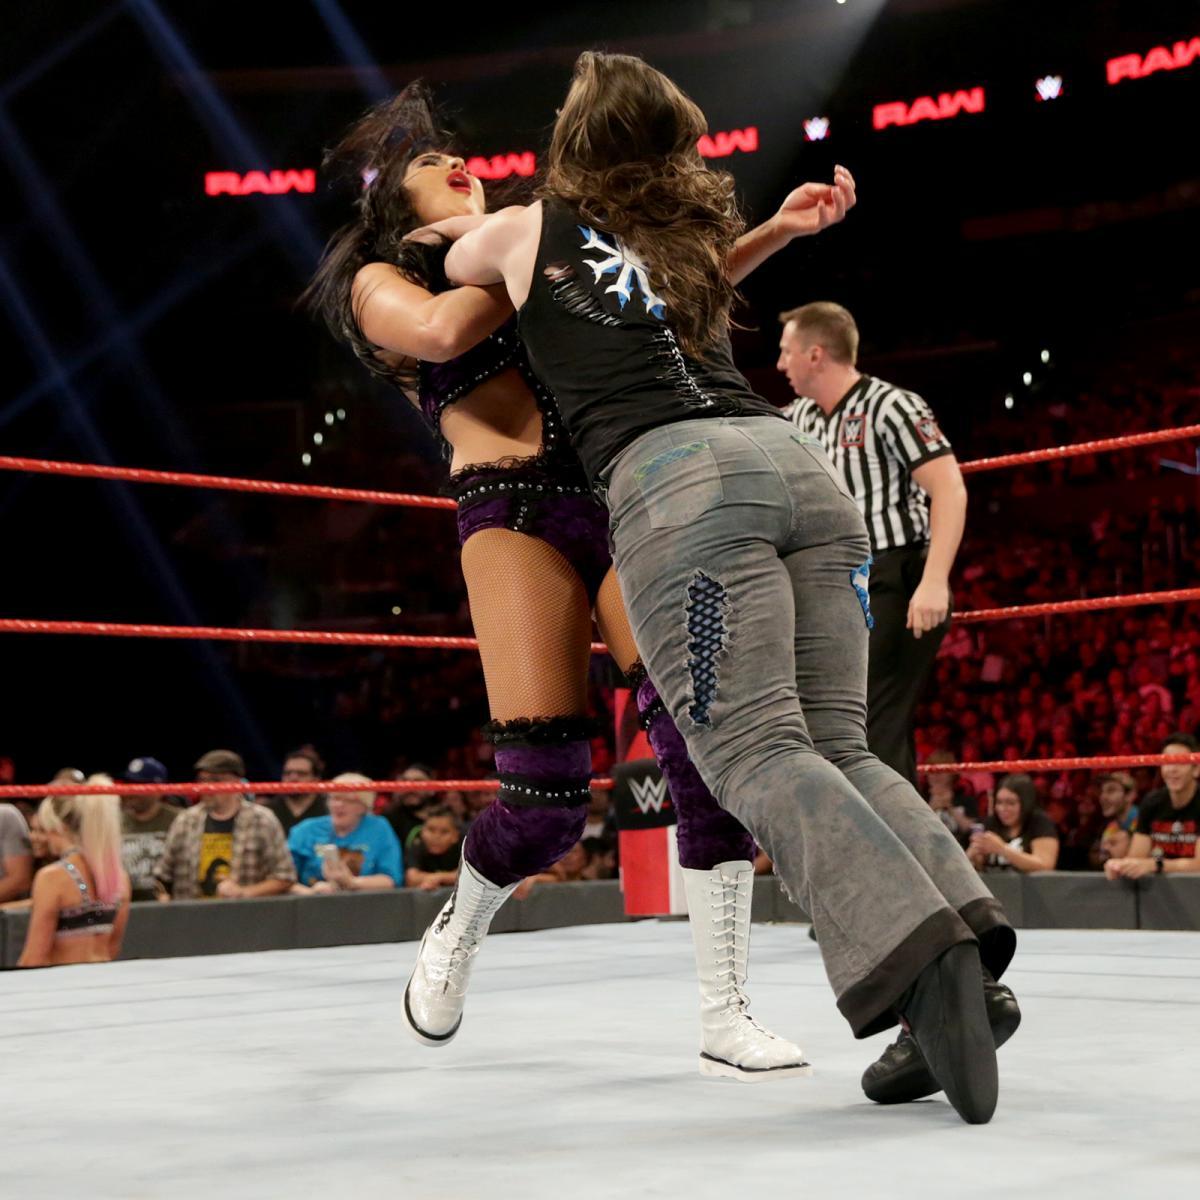 Raw 6/17/19 ~ The IIconics vs Alexa Bliss/Nikki پار, صلیب